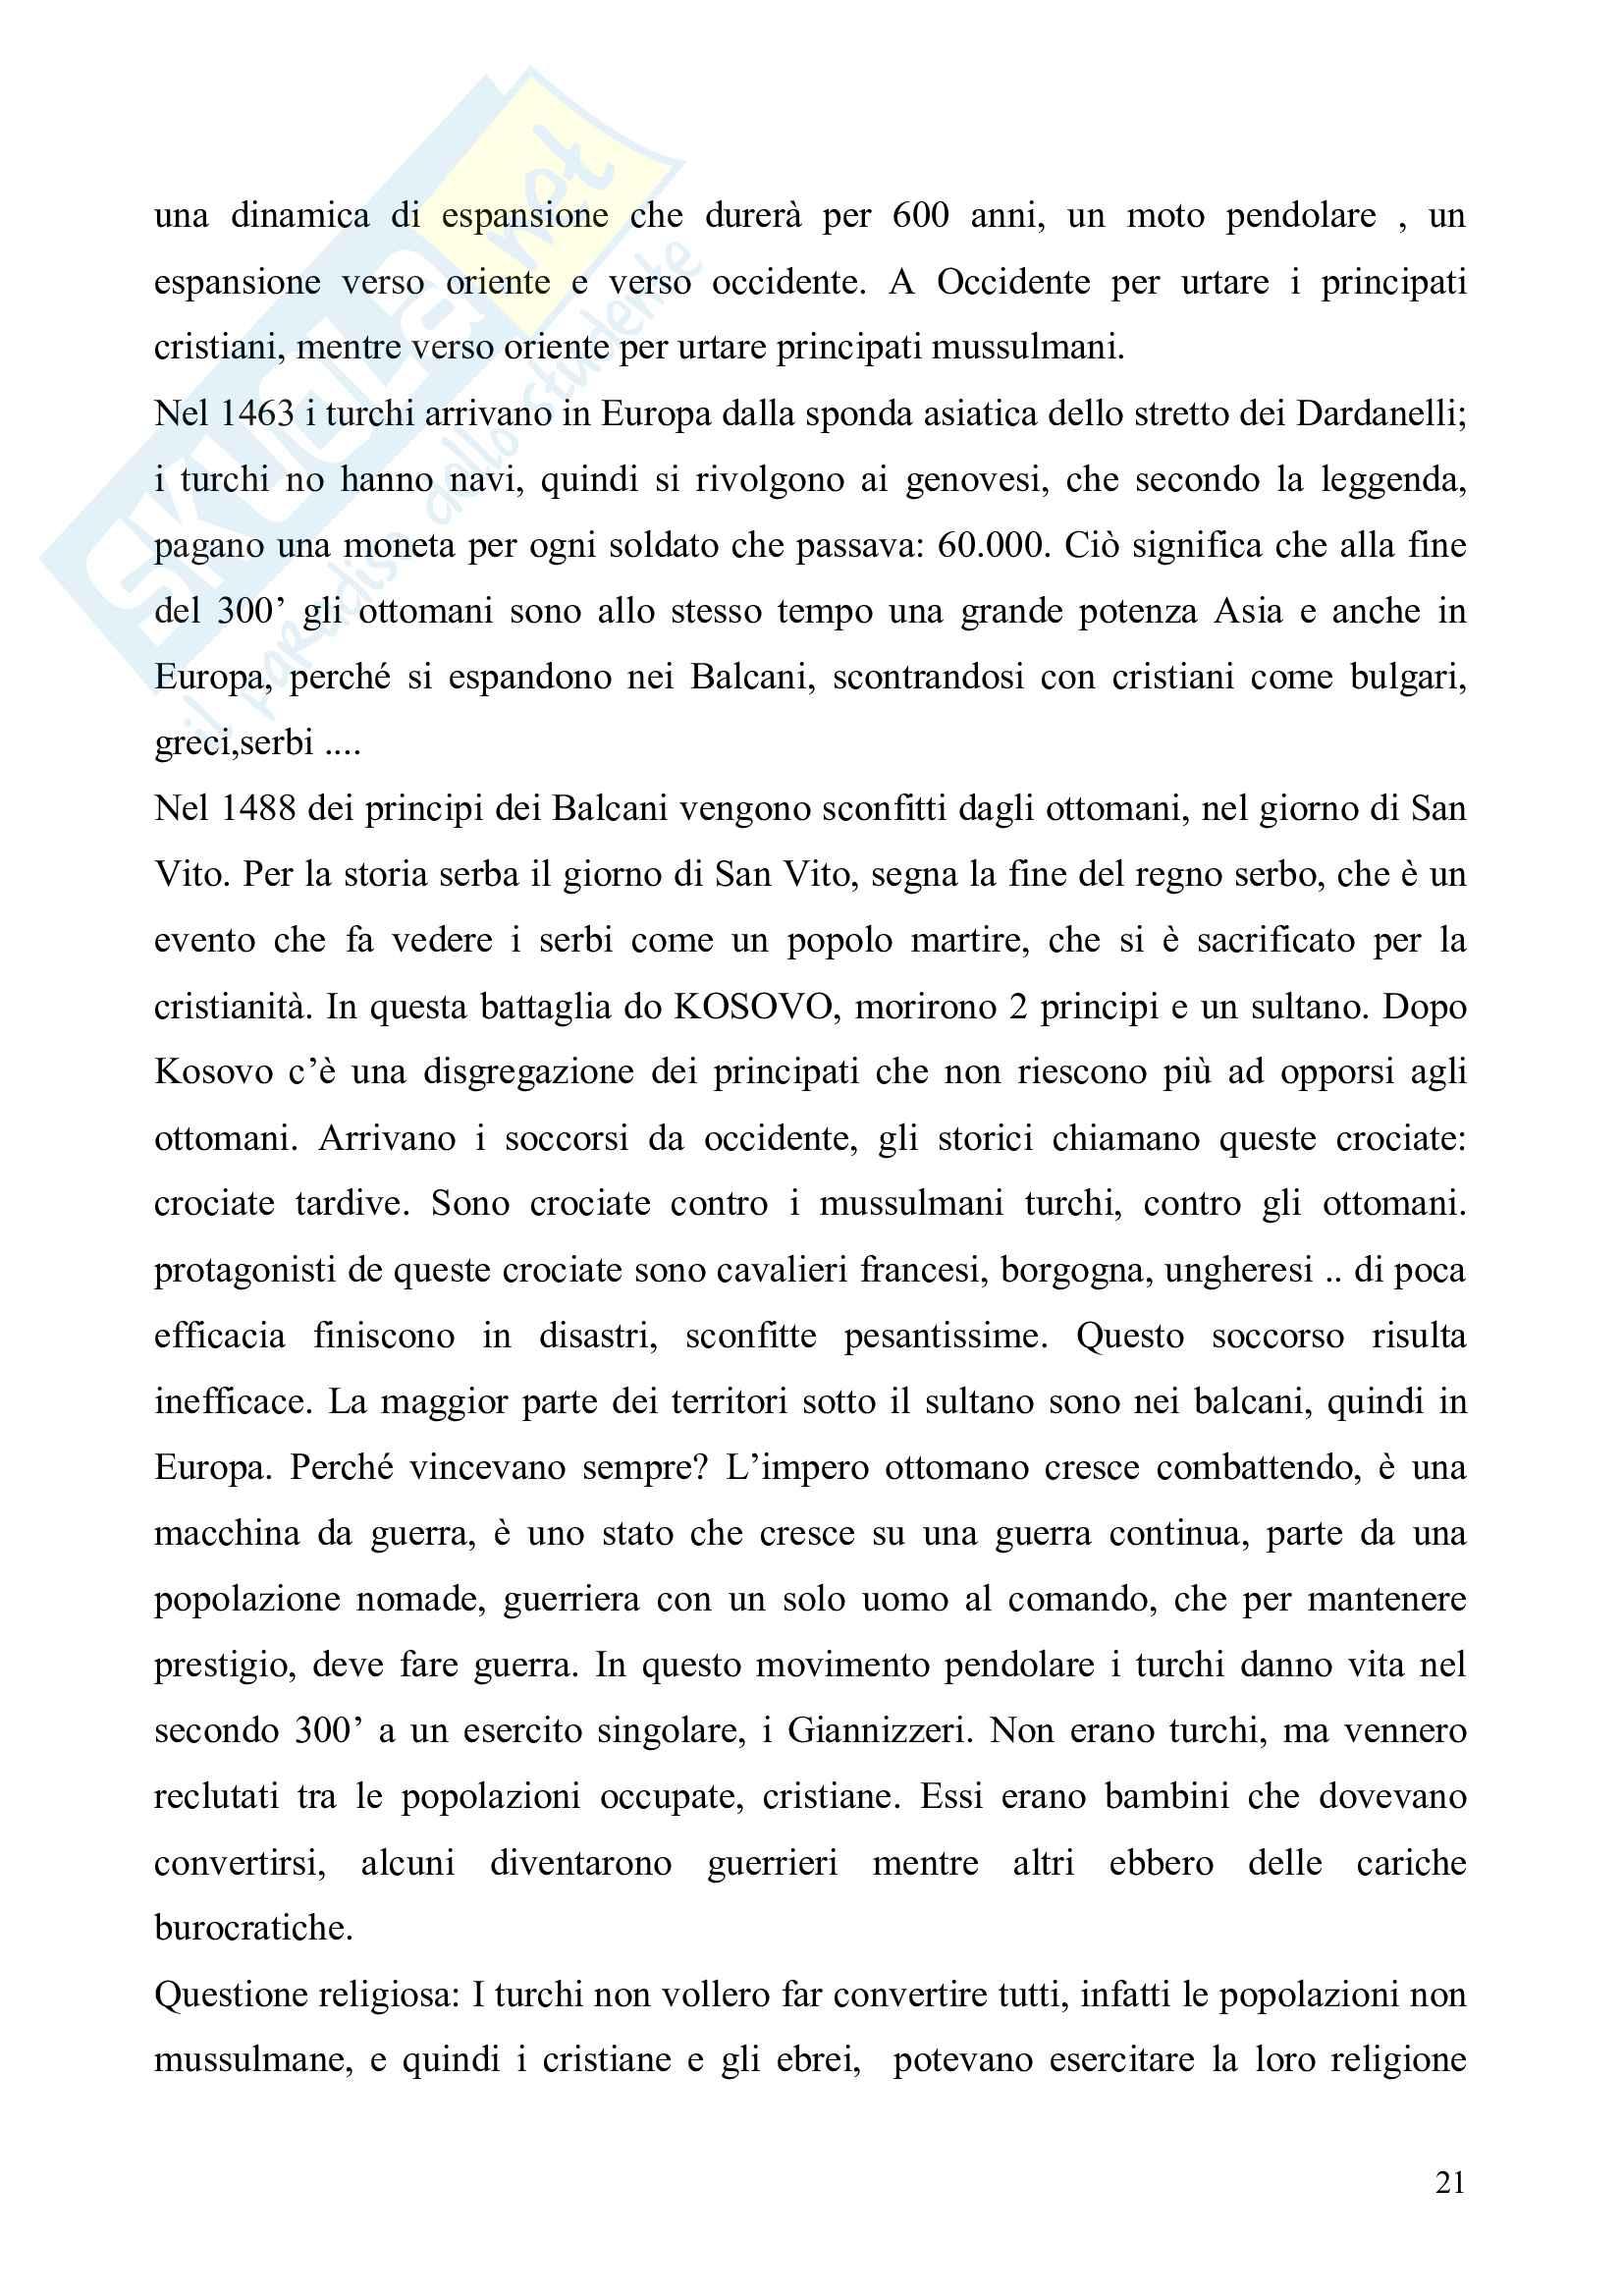 Storia Moderna dal 1492 Pag. 21